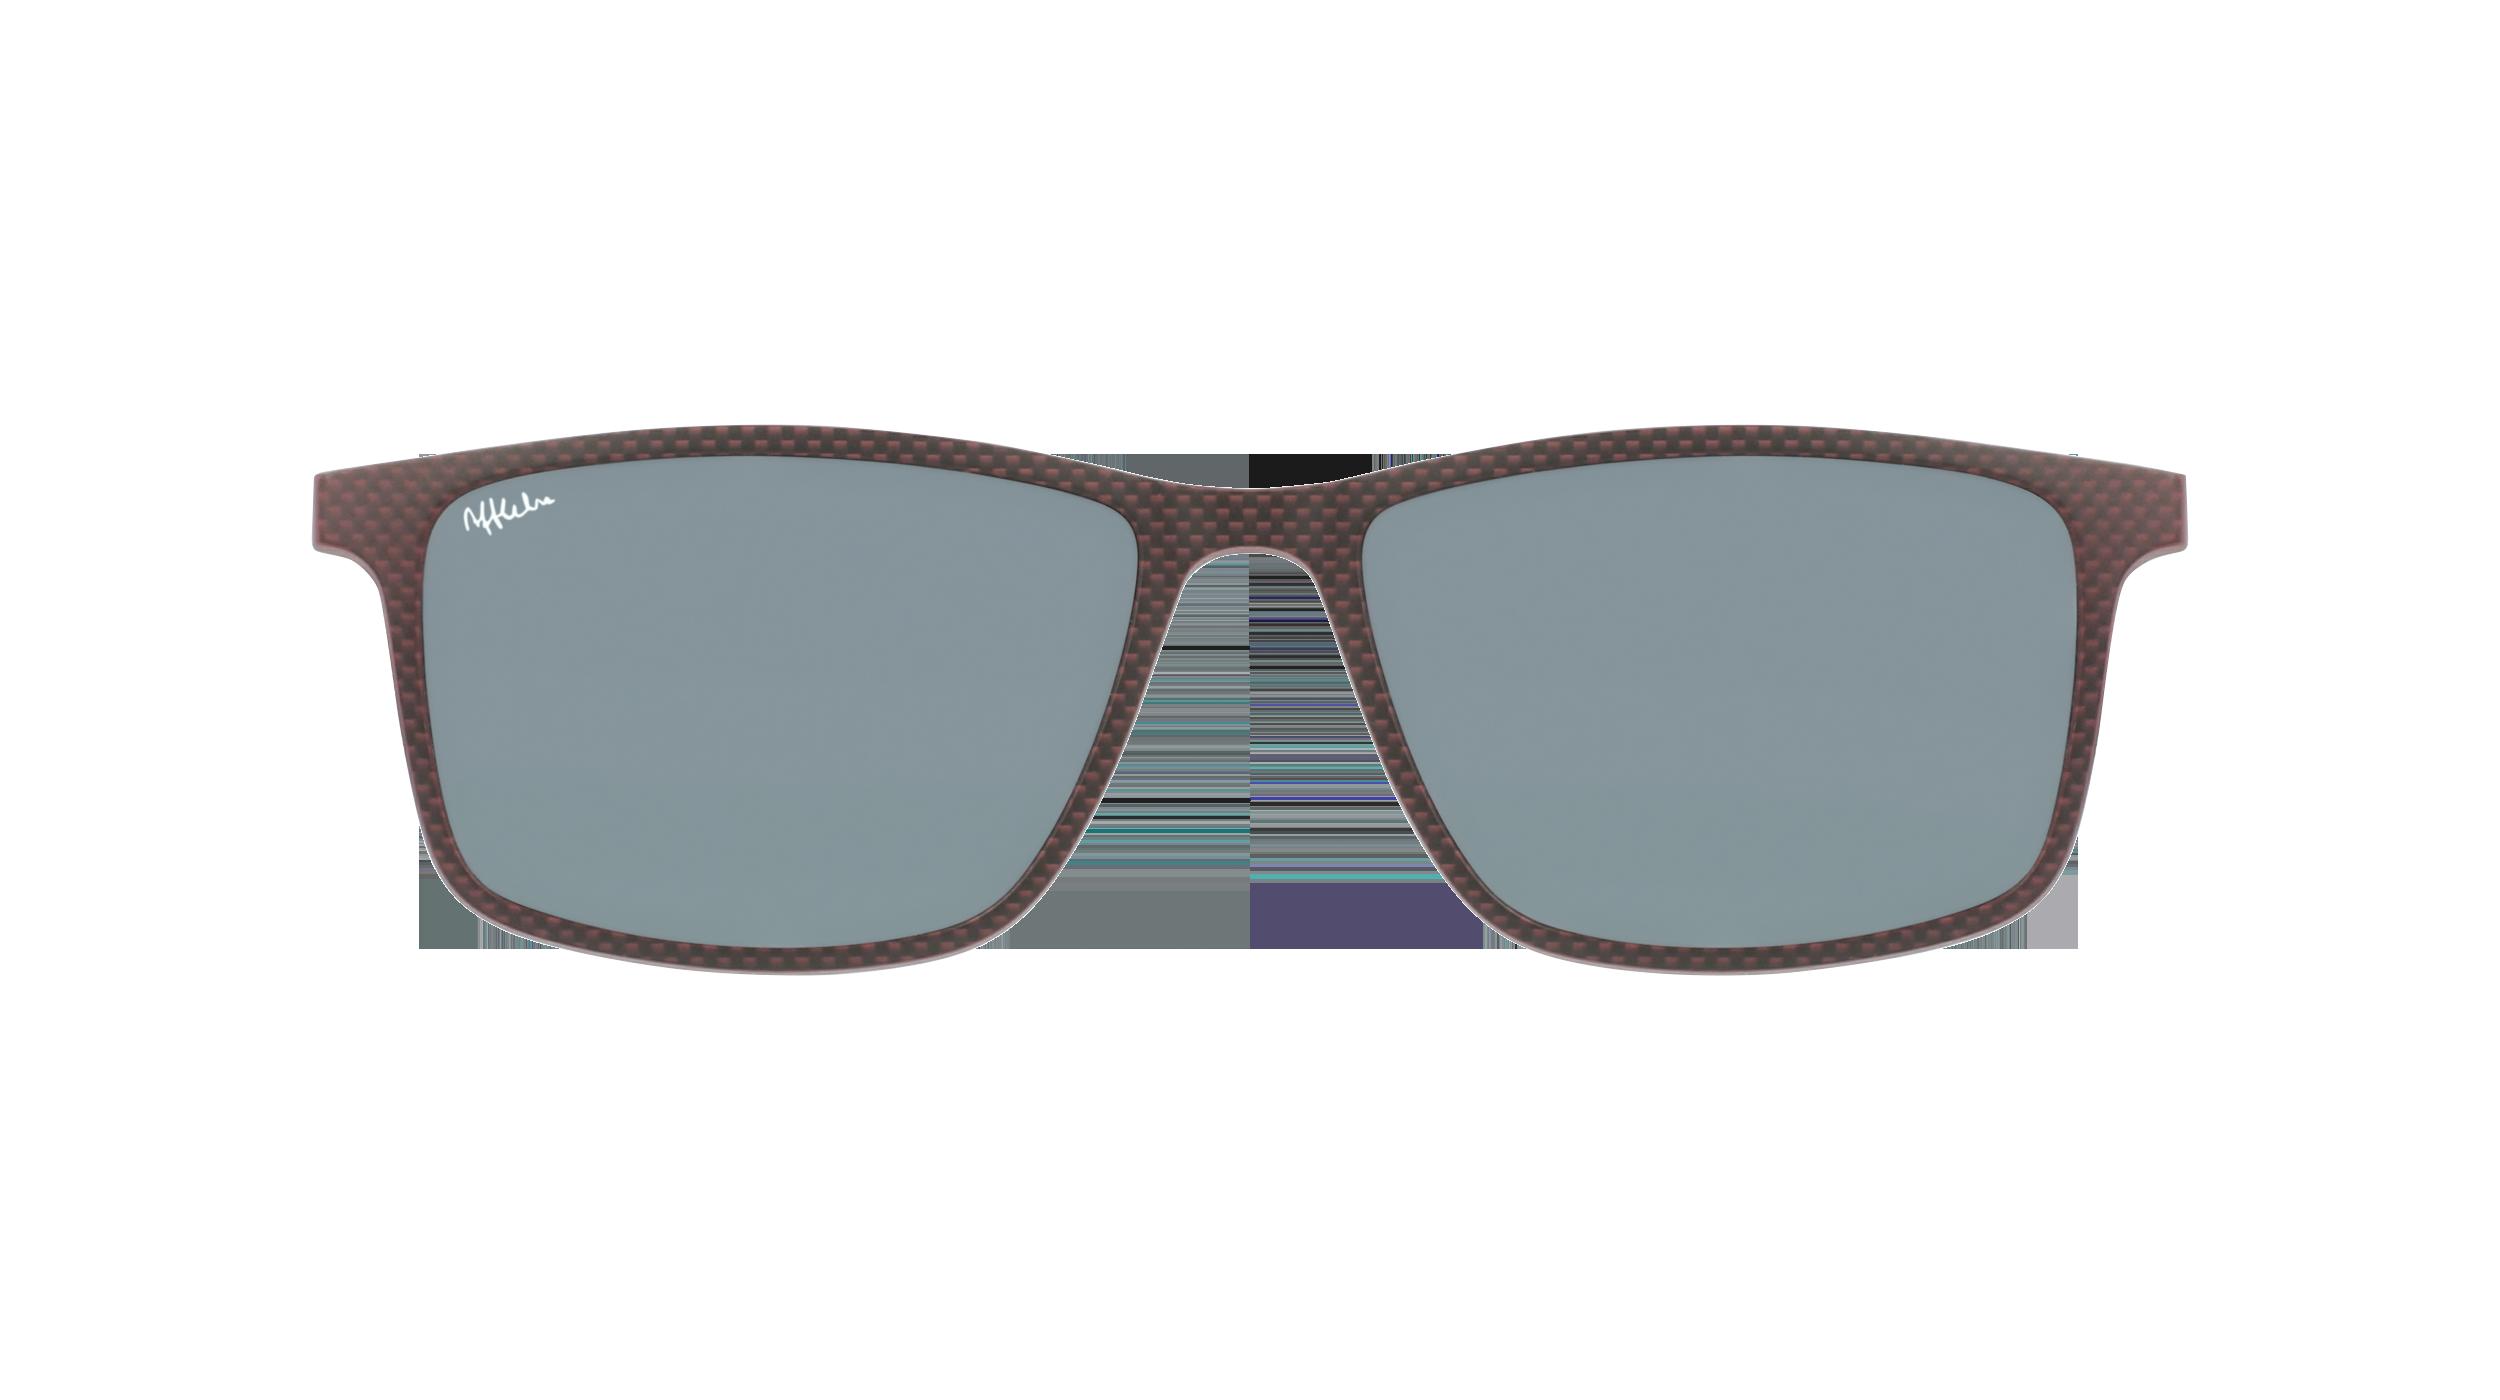 afflelou/france/products/smart_clip/clips_glasses/07630036456996.png